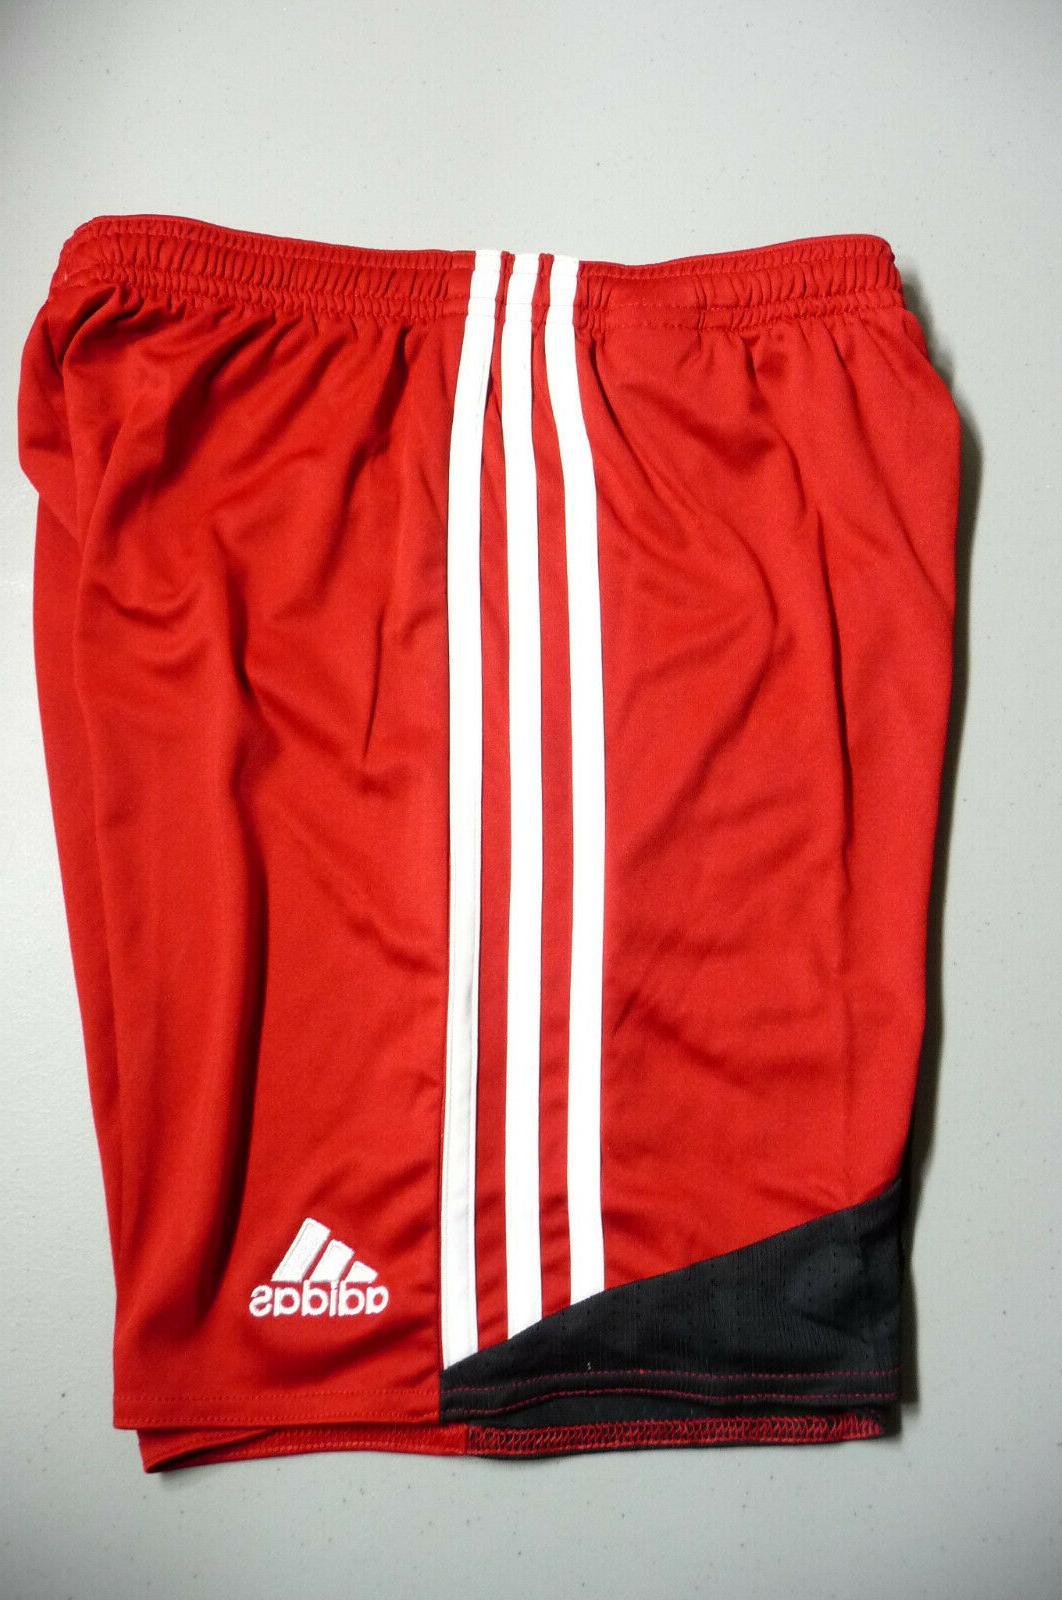 adidas Shorts 16 Various Colors Sizes Uniform